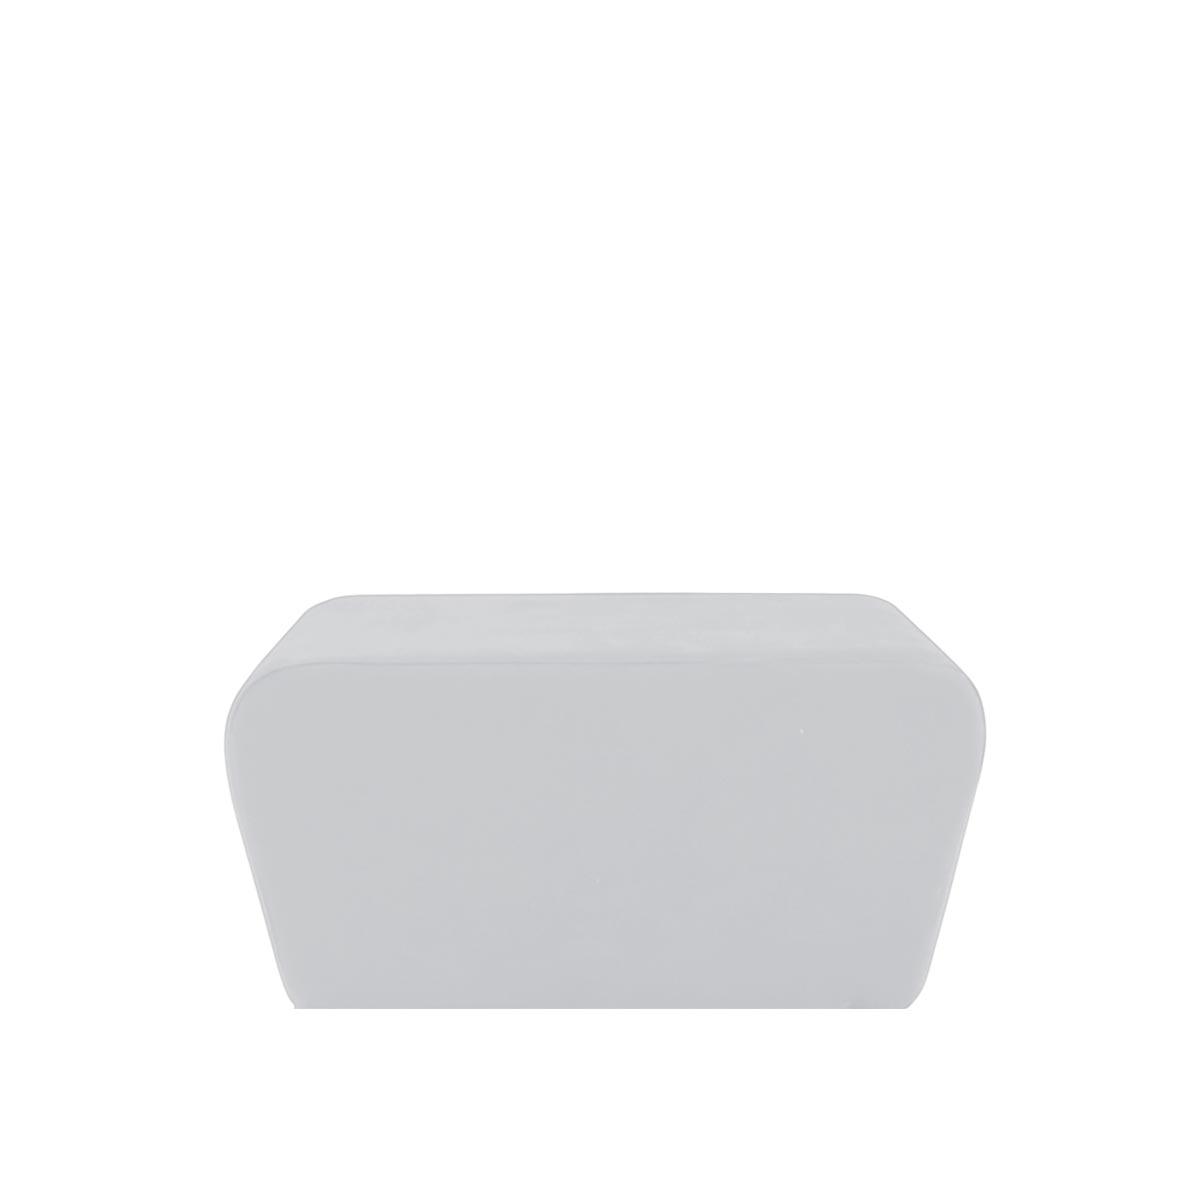 Pufe Muss R02 Tecido Lonita Branco 03